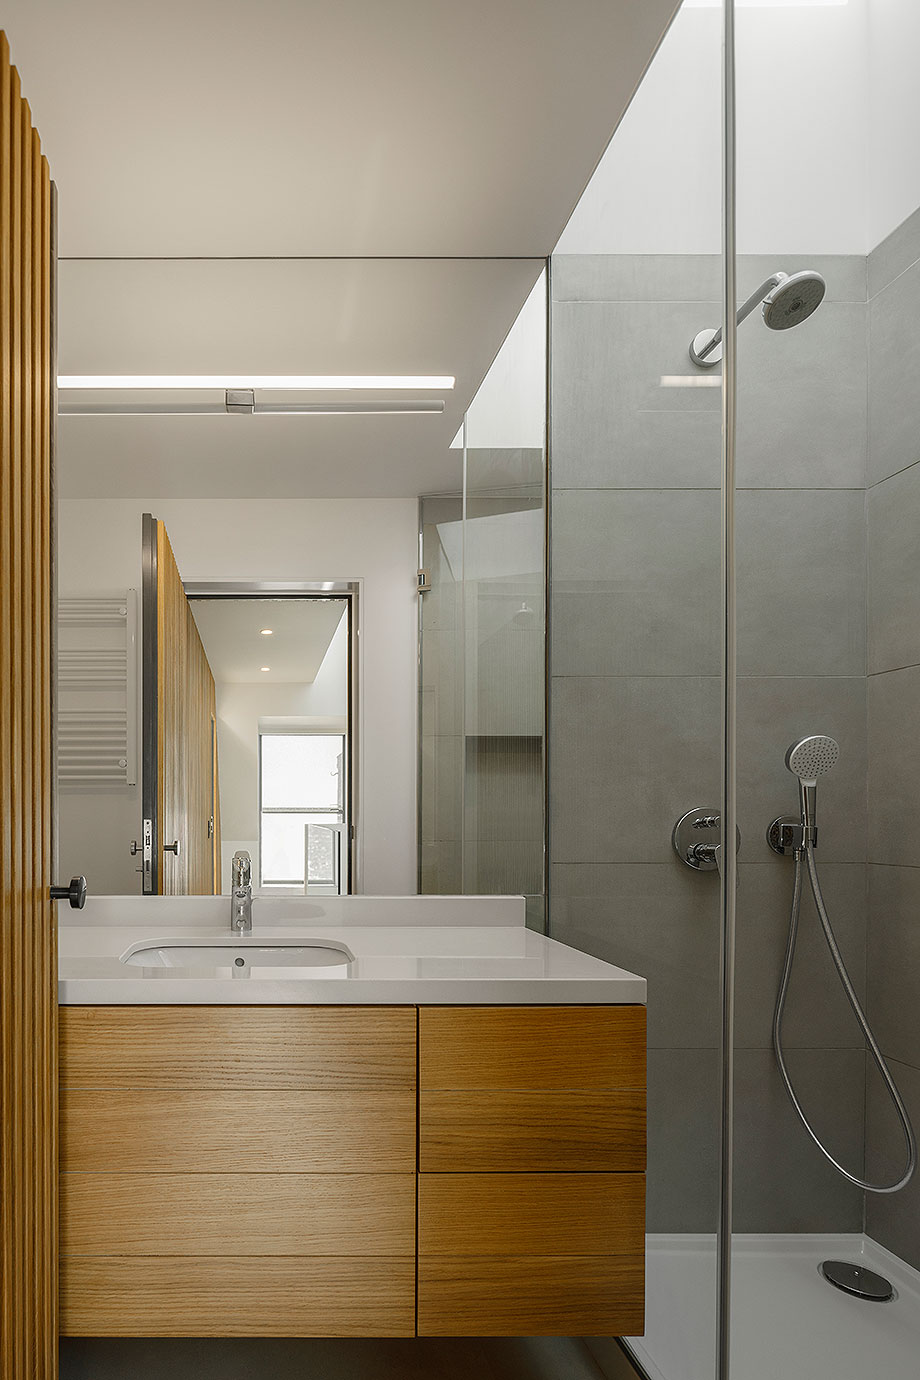 edificio sra da luz en oporto por as arquitecto (22) - foto ivo tavares